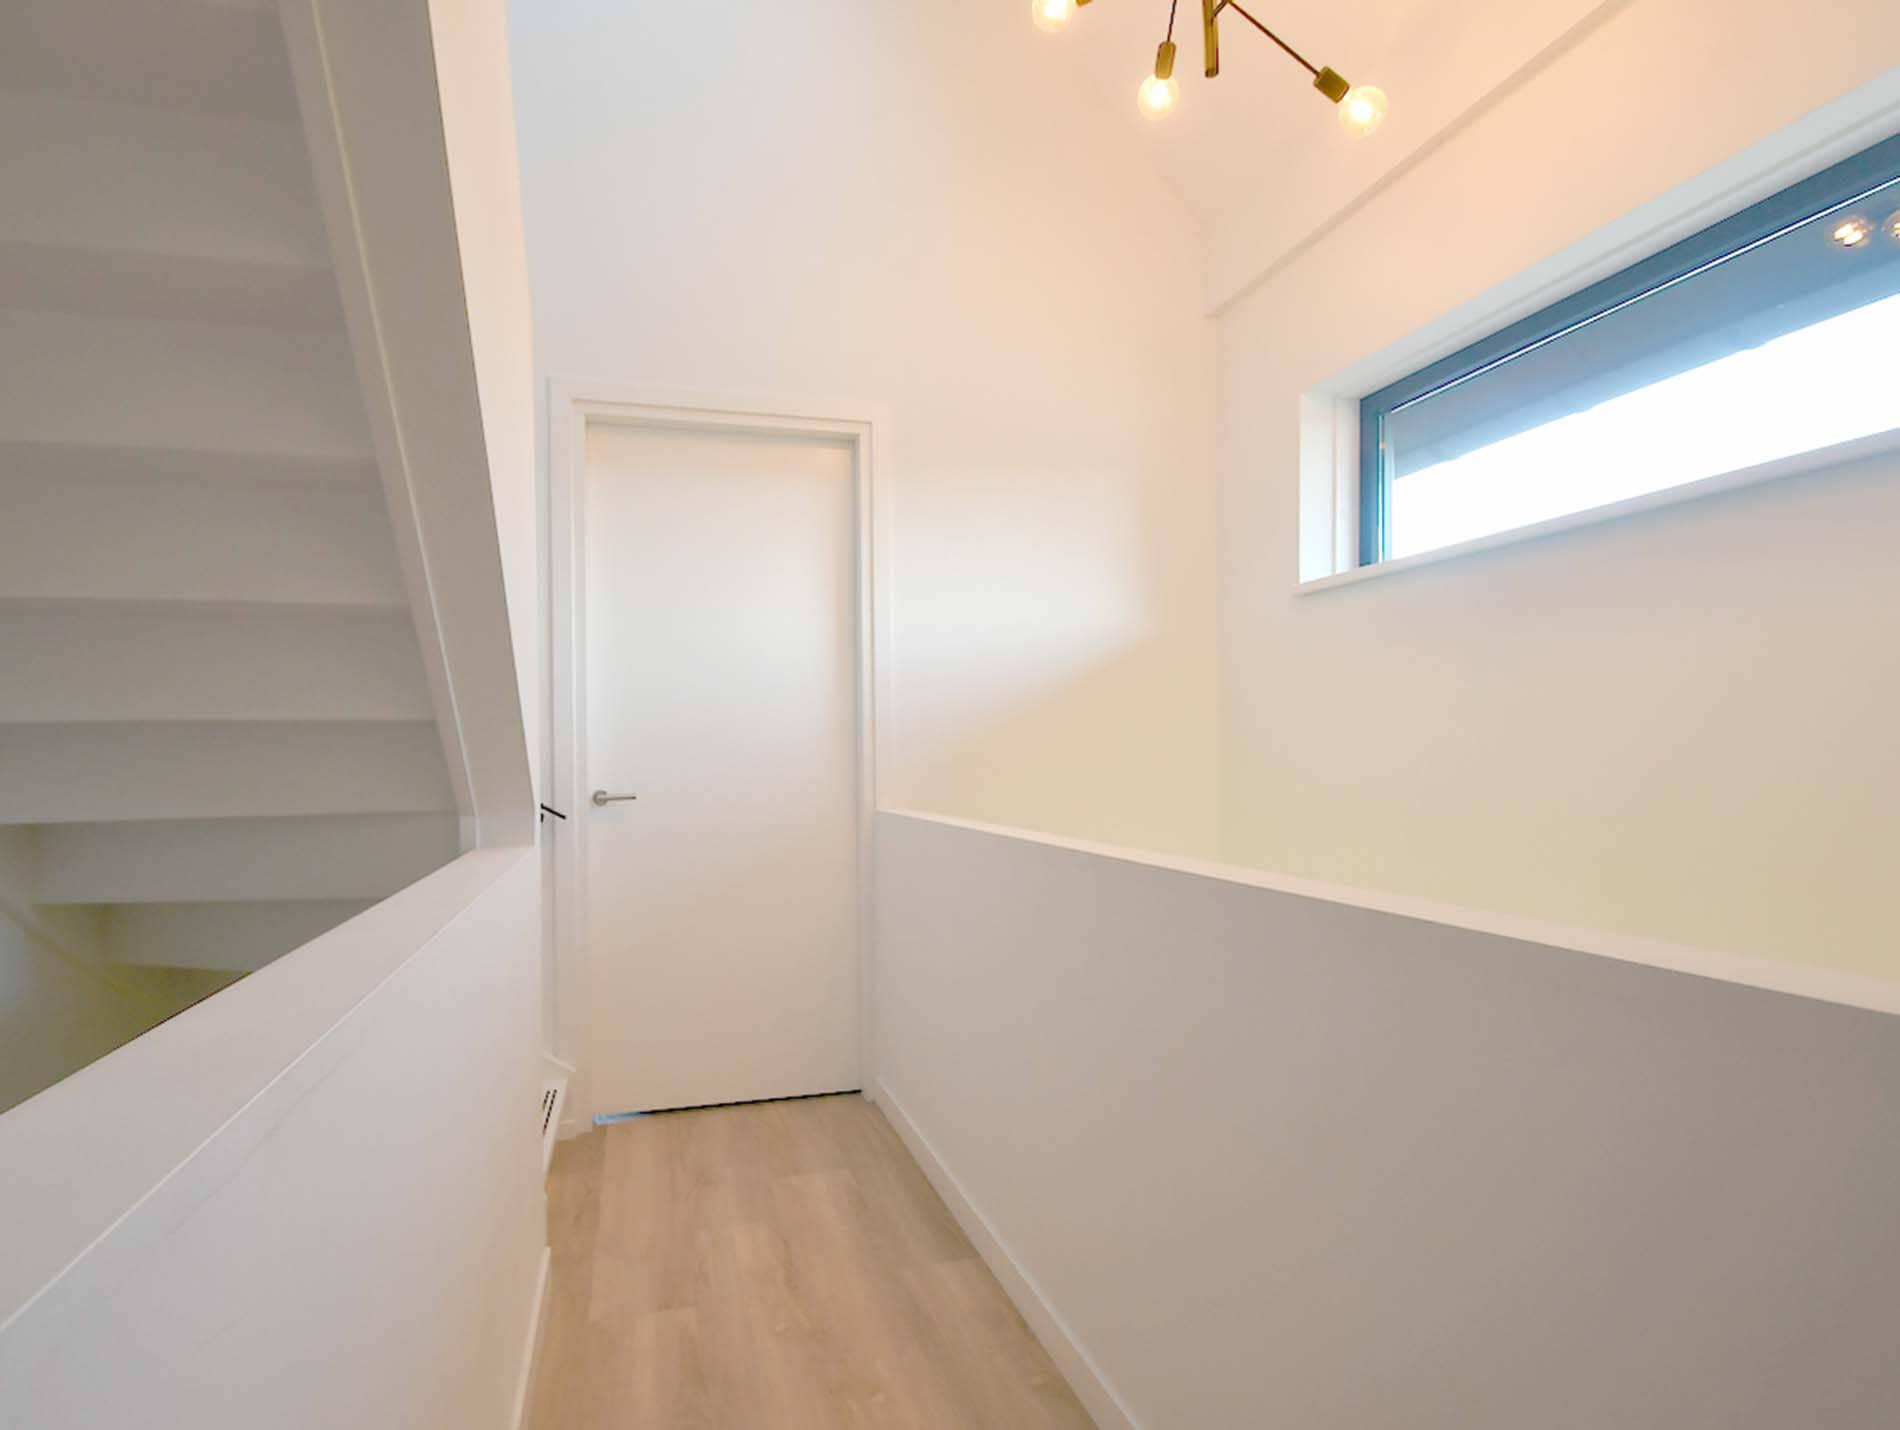 10.Interieur-drachten-nieuwbouw-woning-1900x1430p.jpg